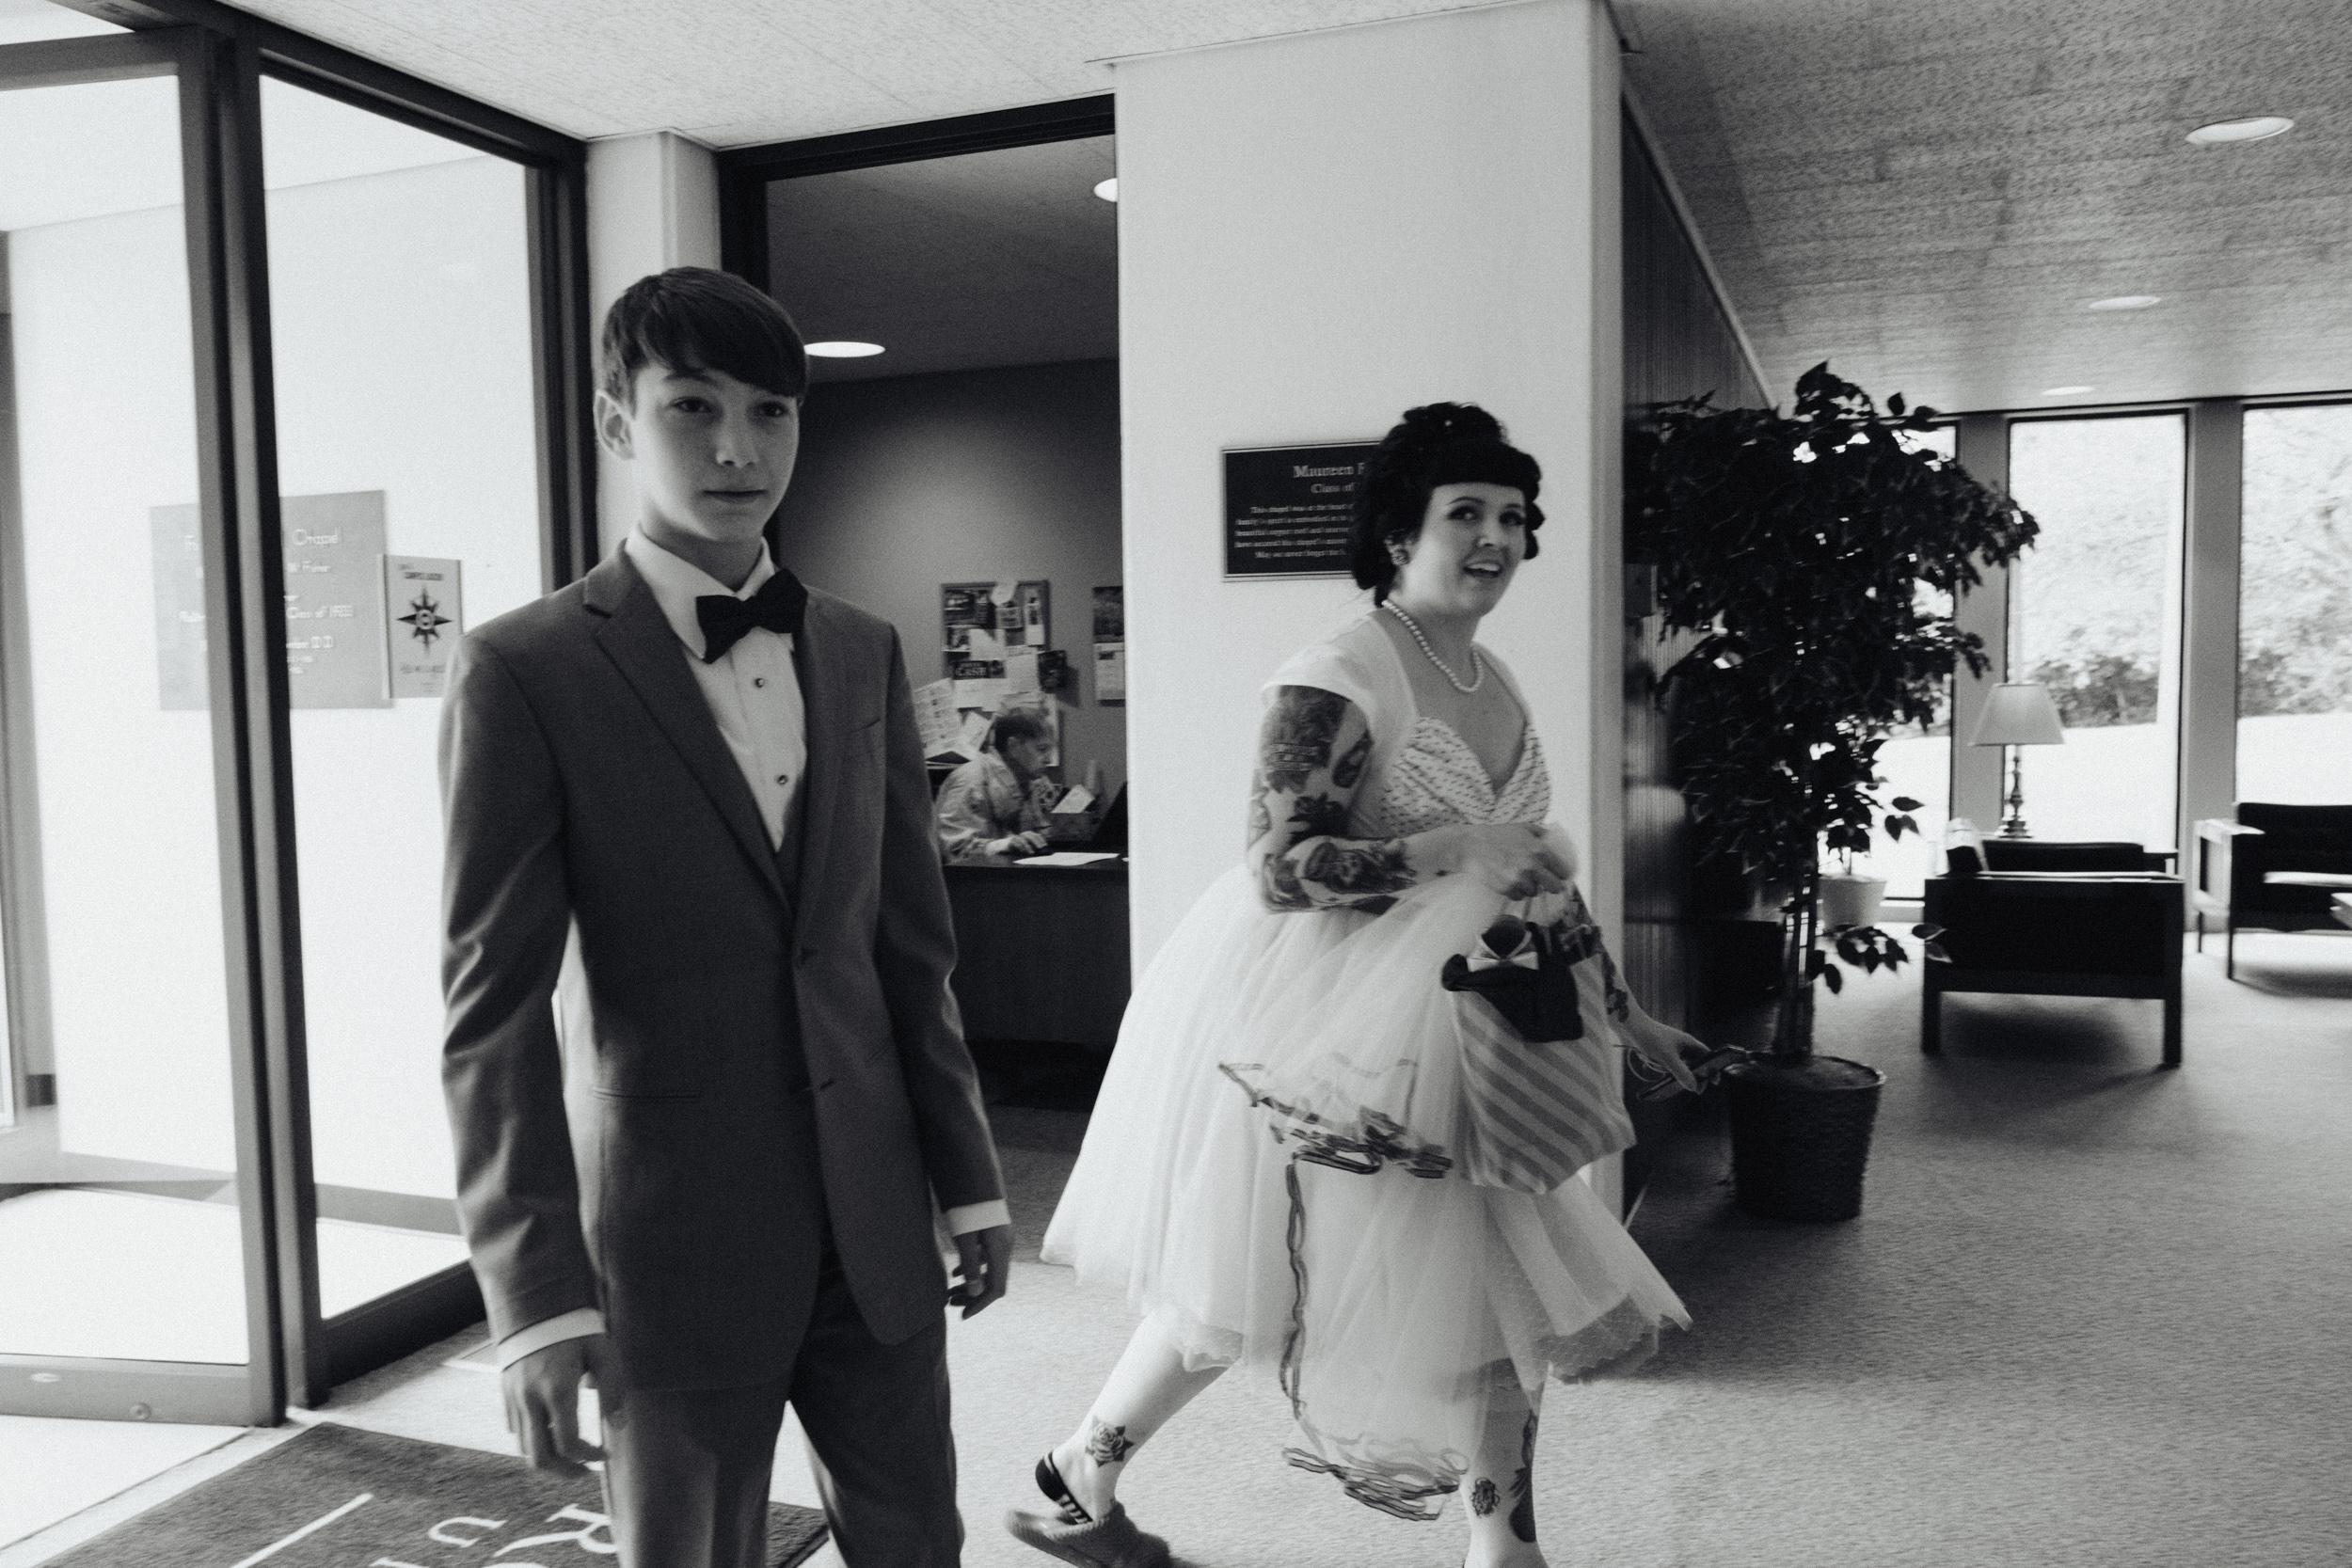 Christian & Sarah wedding photography by Brian milo-123.jpg